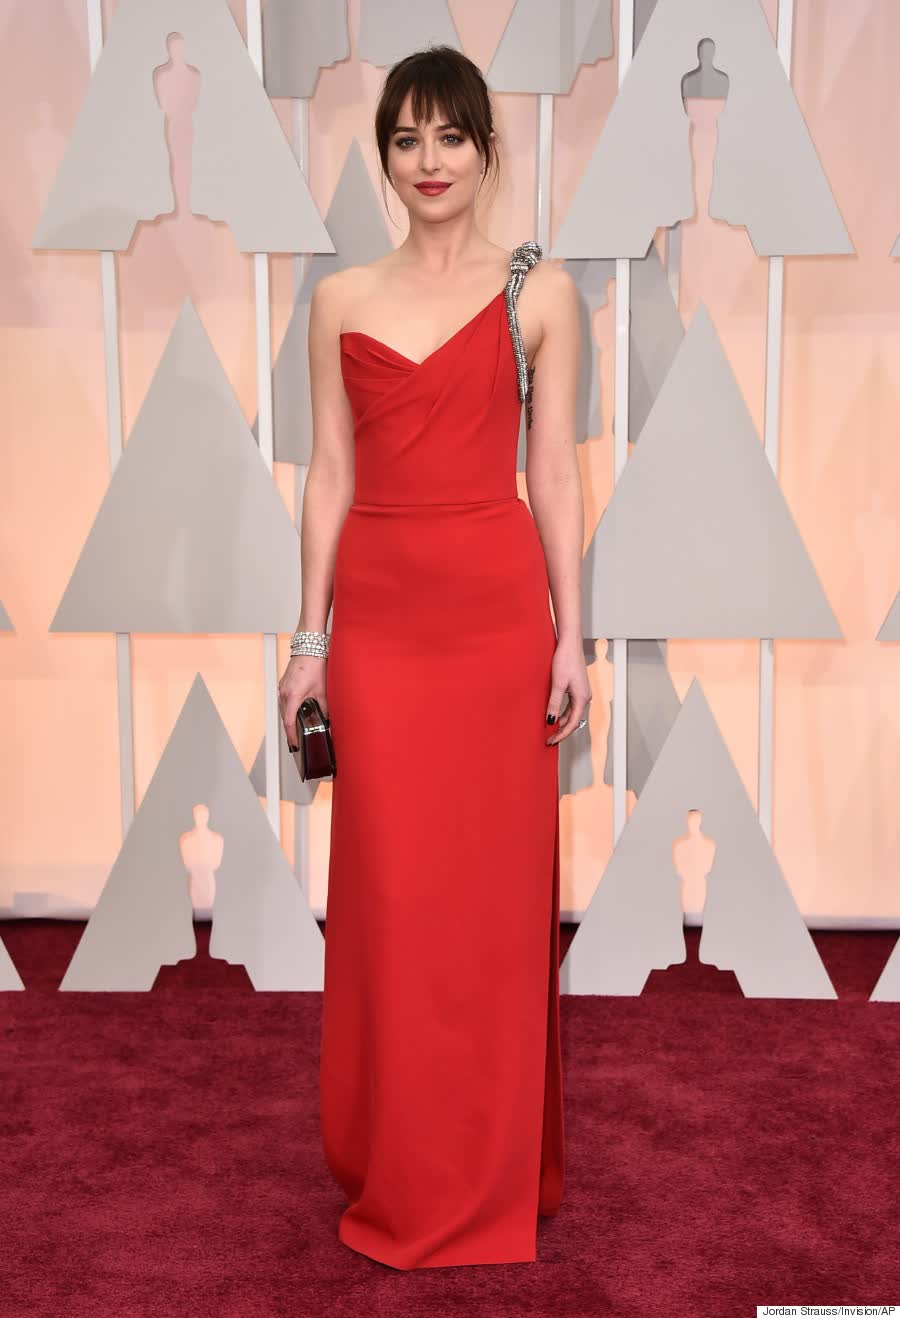 Dakota Johnson aux Oscars 2015